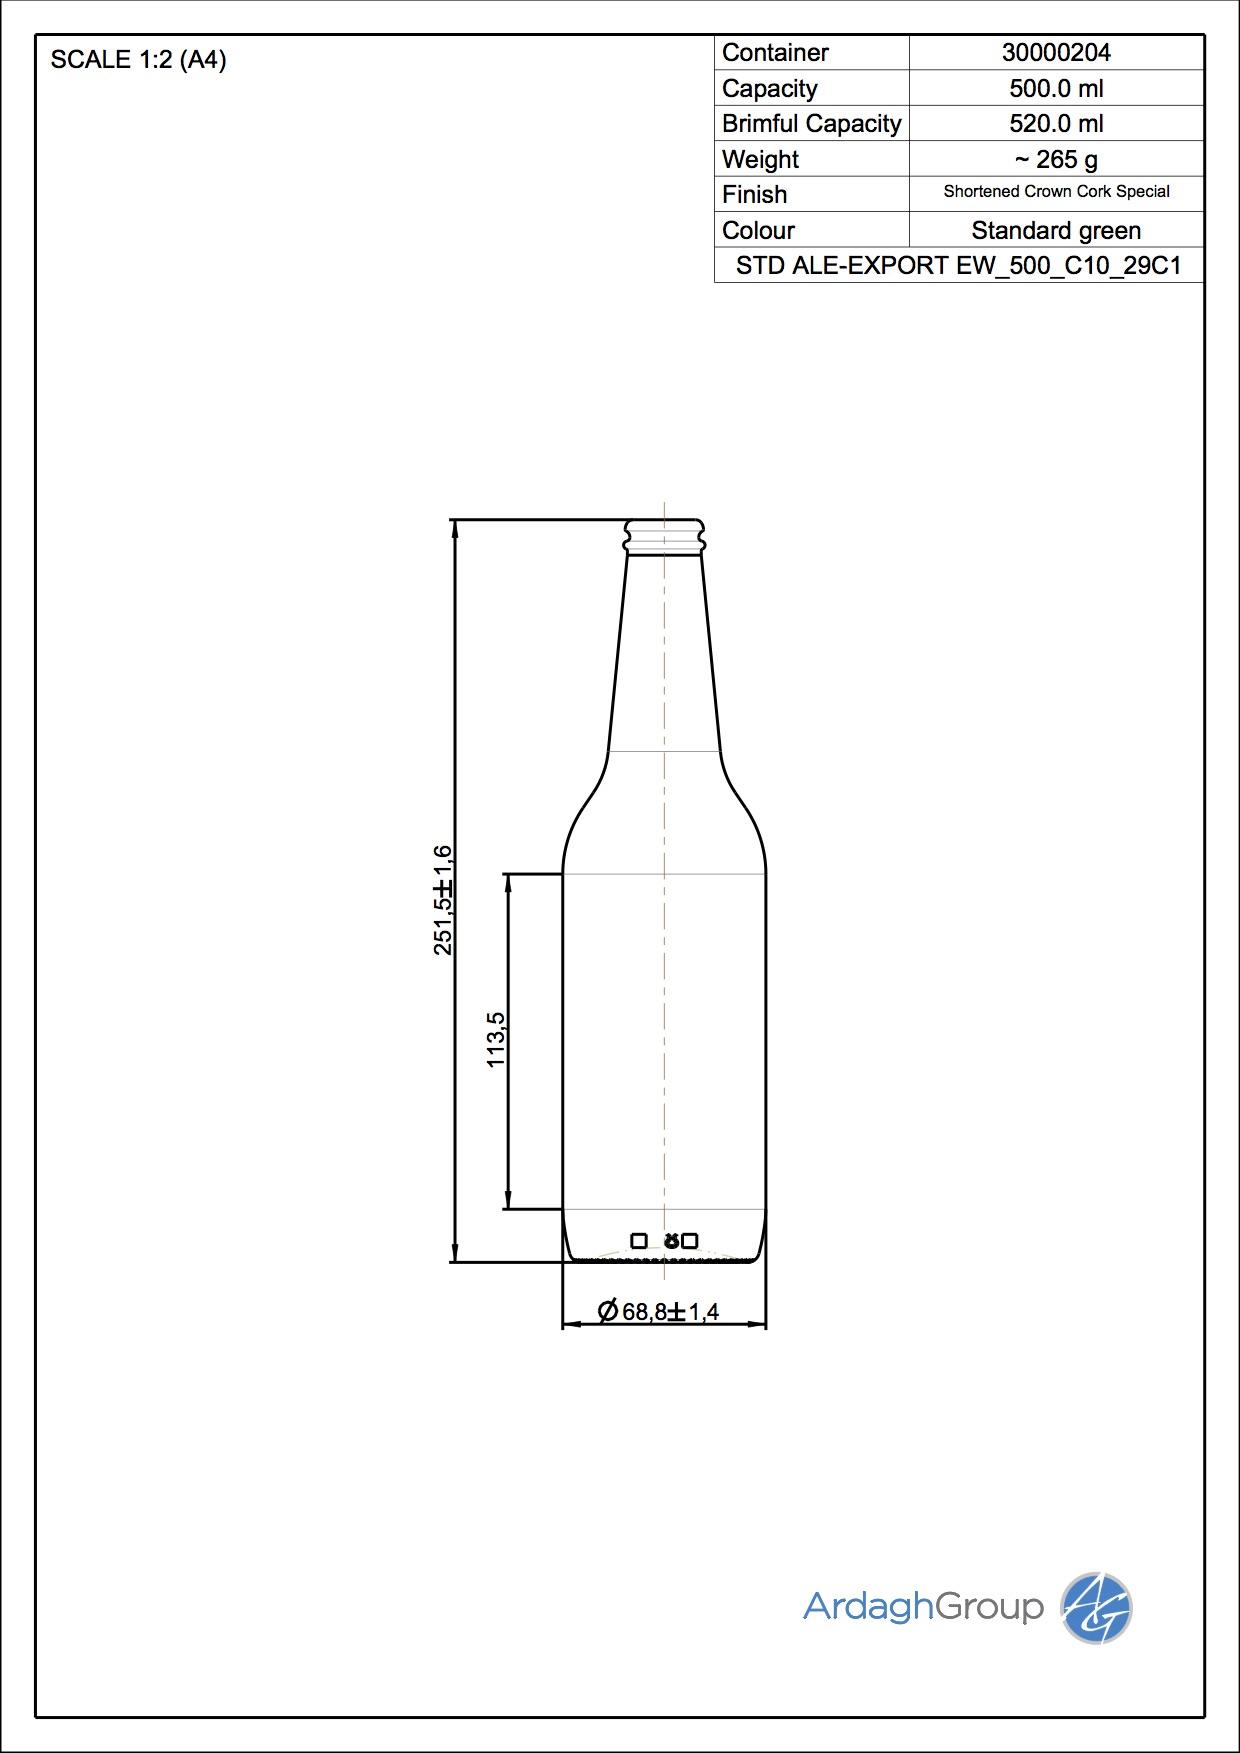 500ml Green Glass Ale-Export Beer Oneway Bottle 30000204